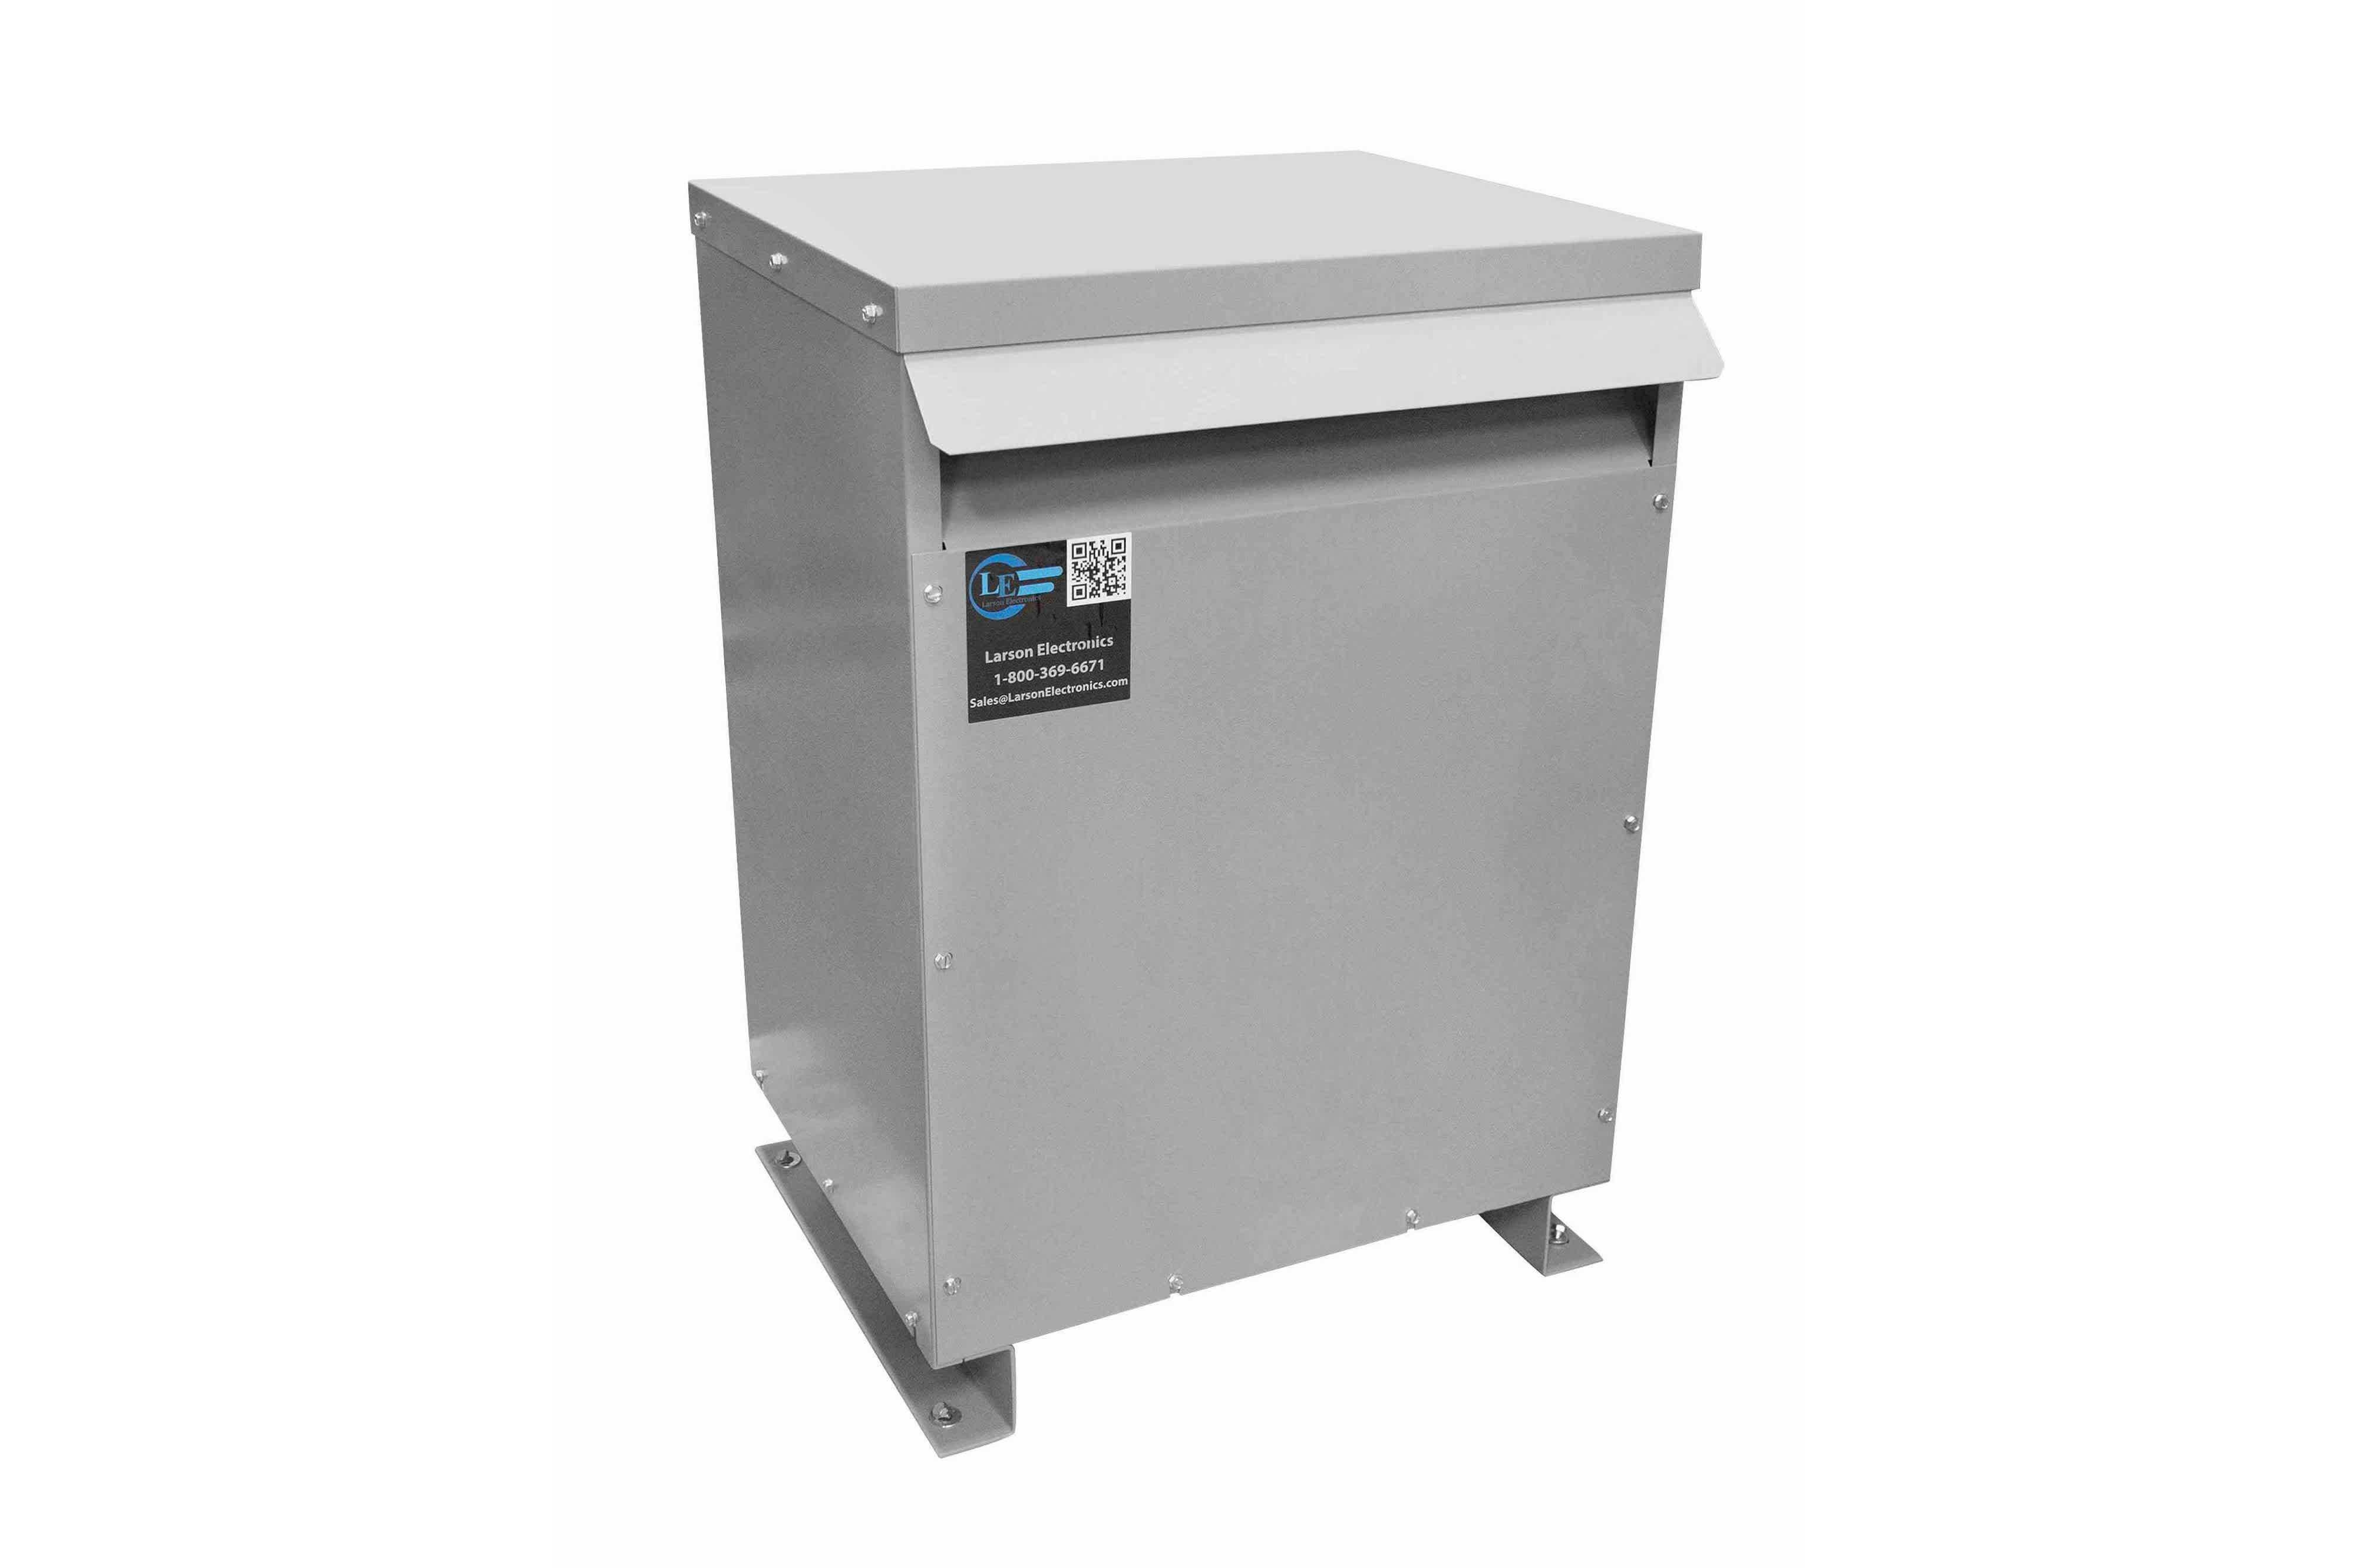 22.5 kVA 3PH Isolation Transformer, 415V Wye Primary, 480Y/277 Wye-N Secondary, N3R, Ventilated, 60 Hz